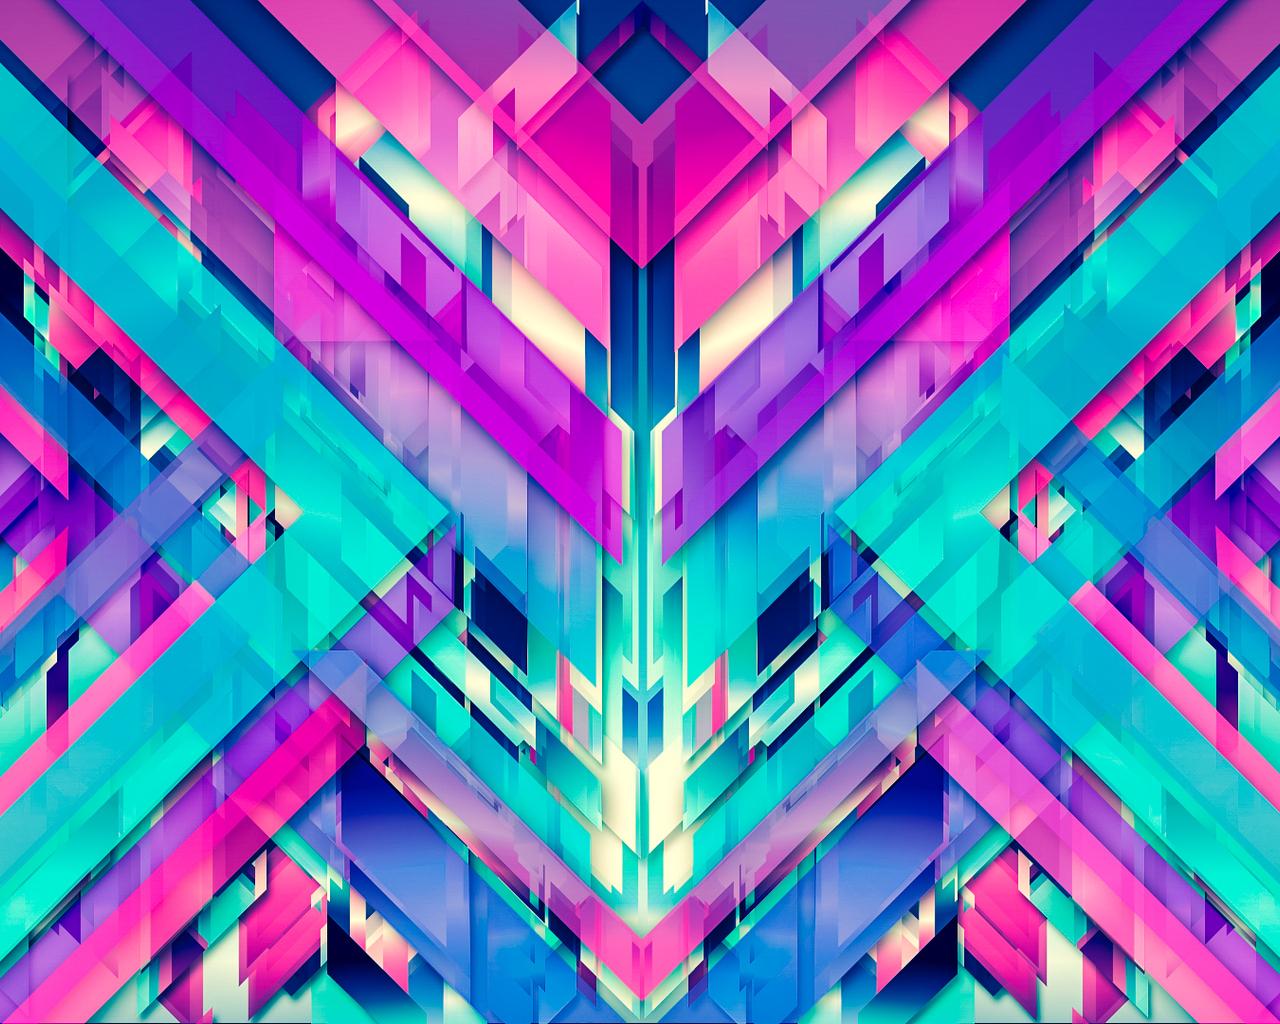 graphics-digital-art-abstract-zz.jpg